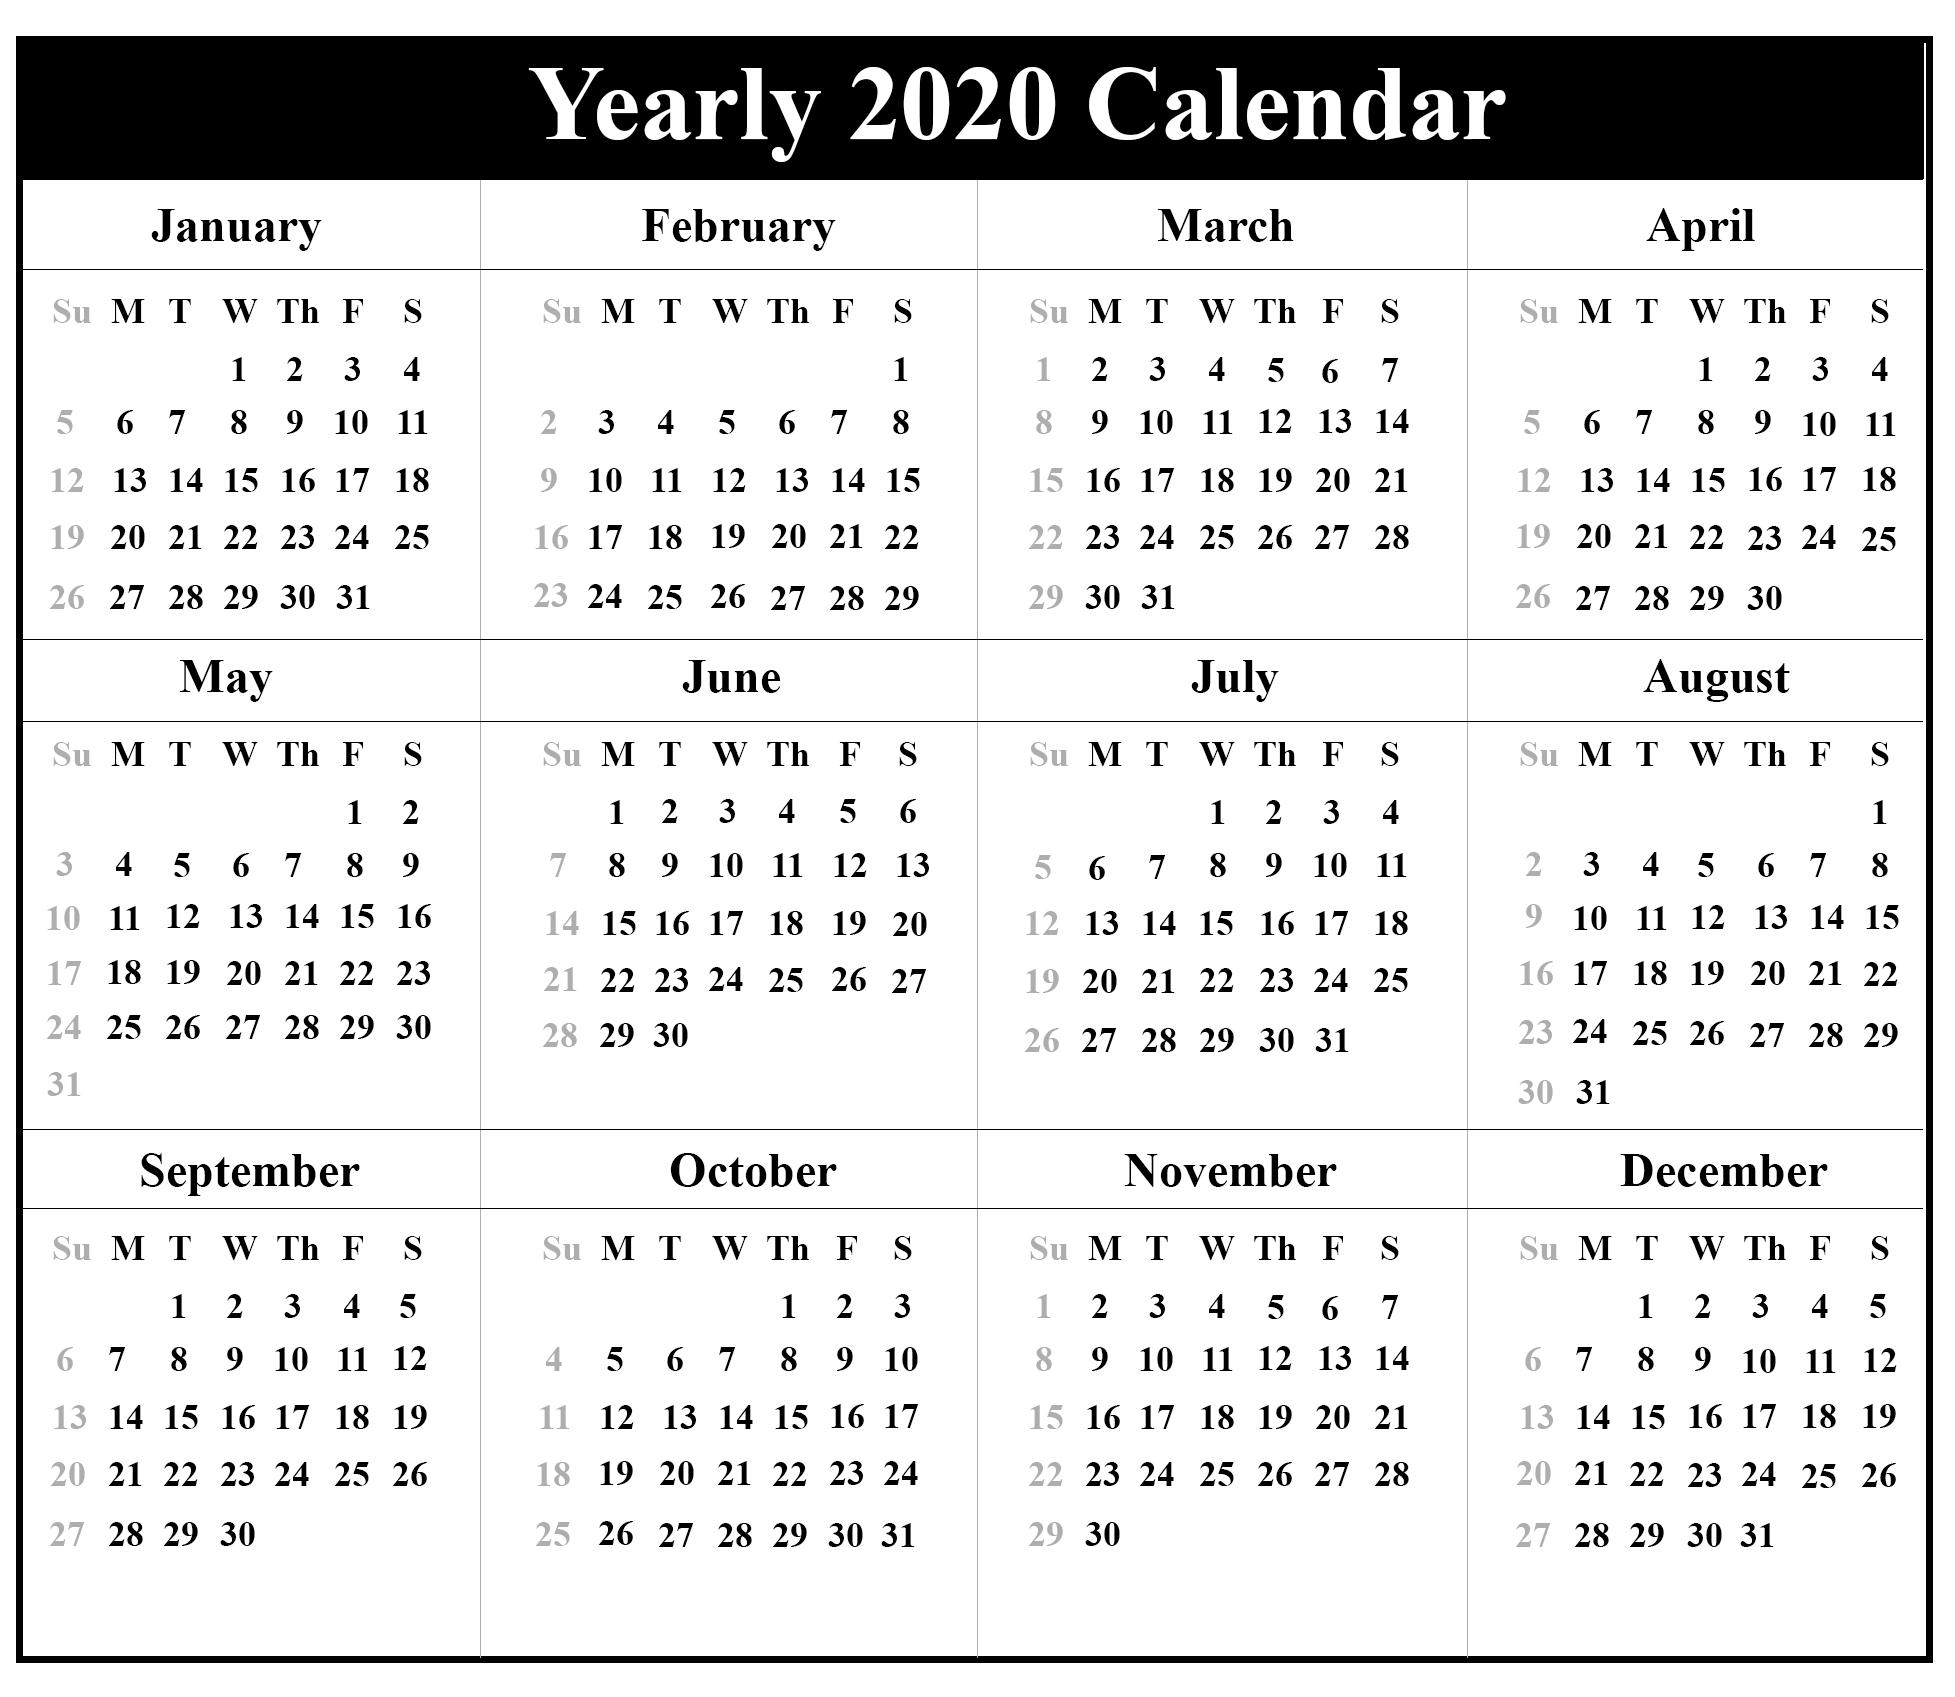 Printable Yearly Calendar 2020 Template With Holidays [Pdf-2020 Calendar Muslim Holidays